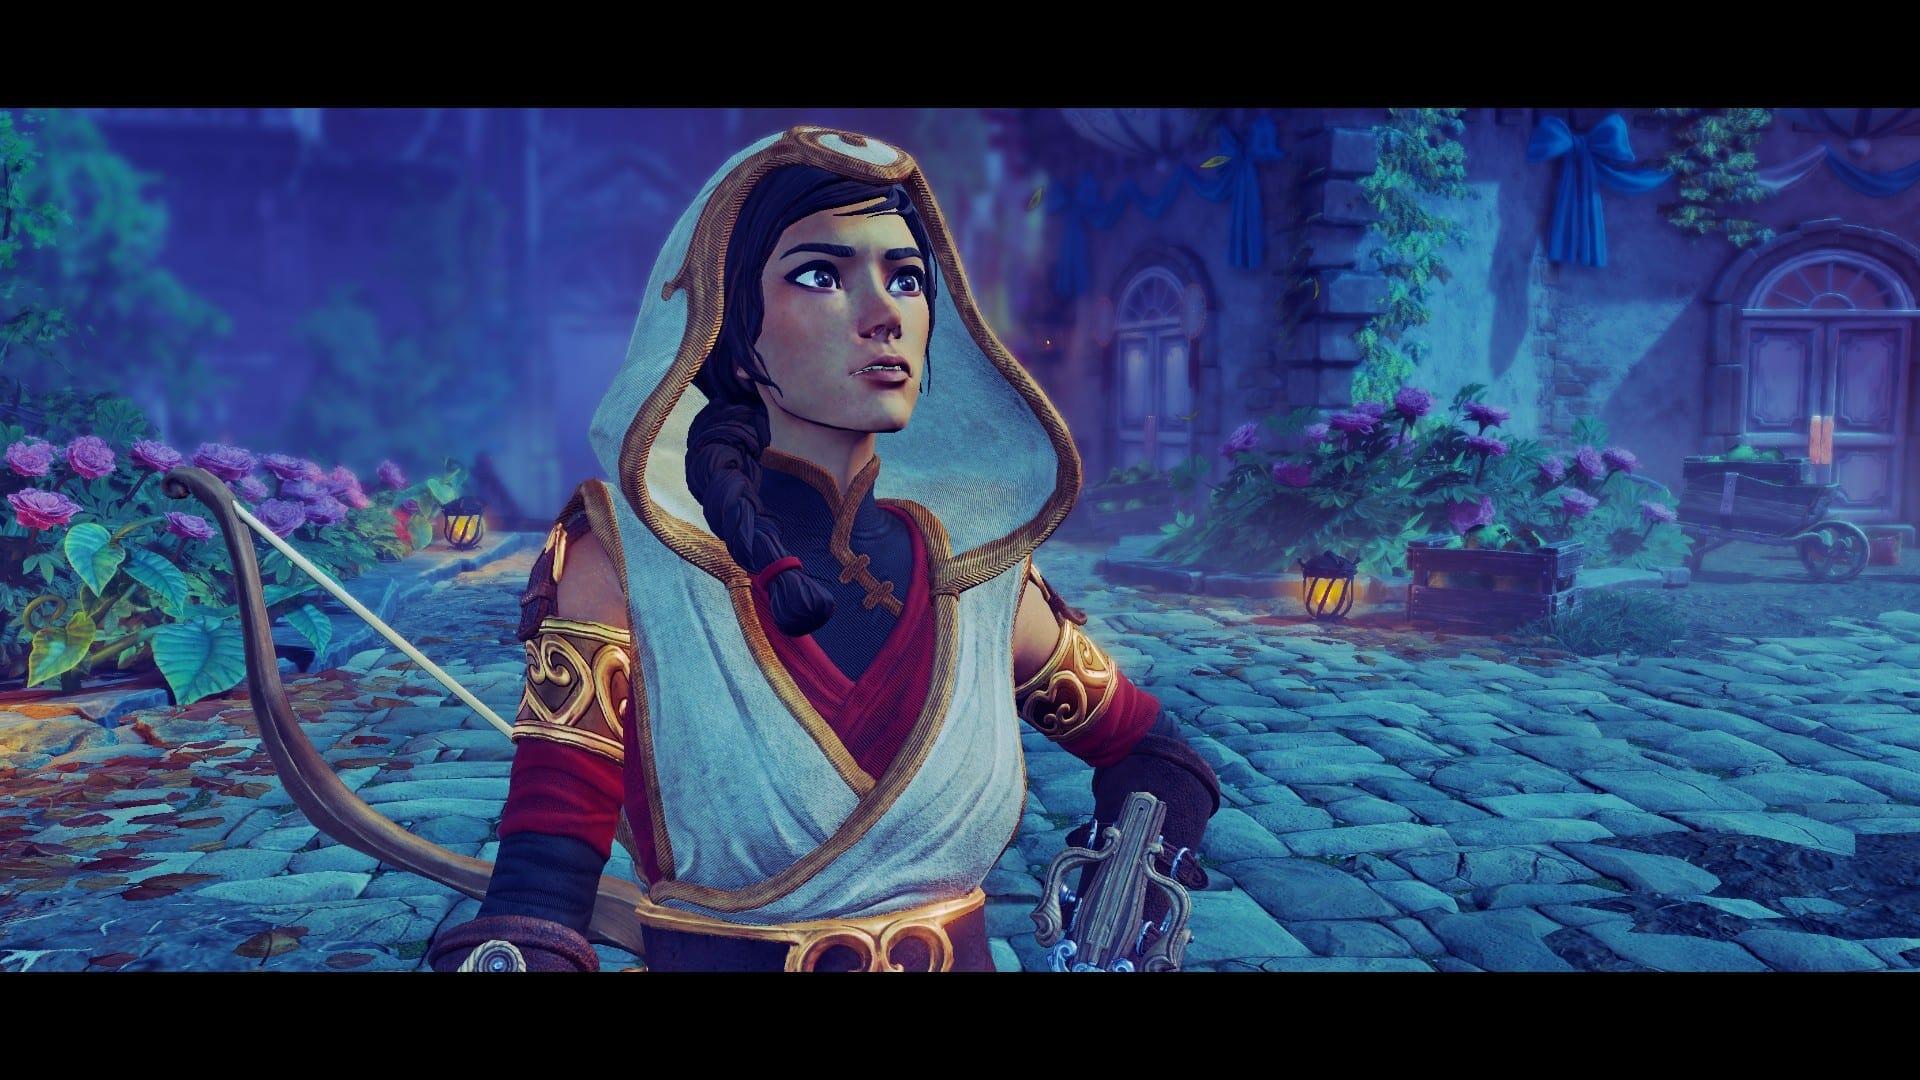 Zaya from Trine 4 - Trine 4: The Nightmare Prince Review - A Triumphant Return